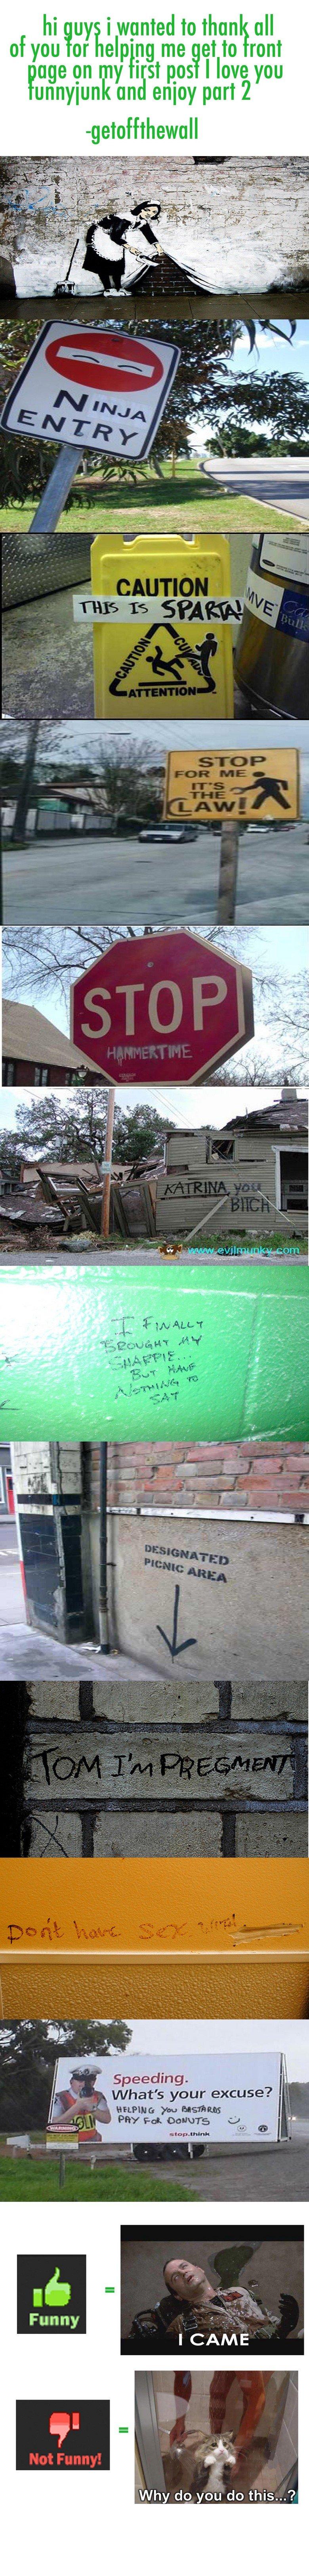 Funny Graffiti Comp. Part 2. i'll make part 3 if u guys want just ask.. :O shes pregment ! Graffiti comp Part me Gusta